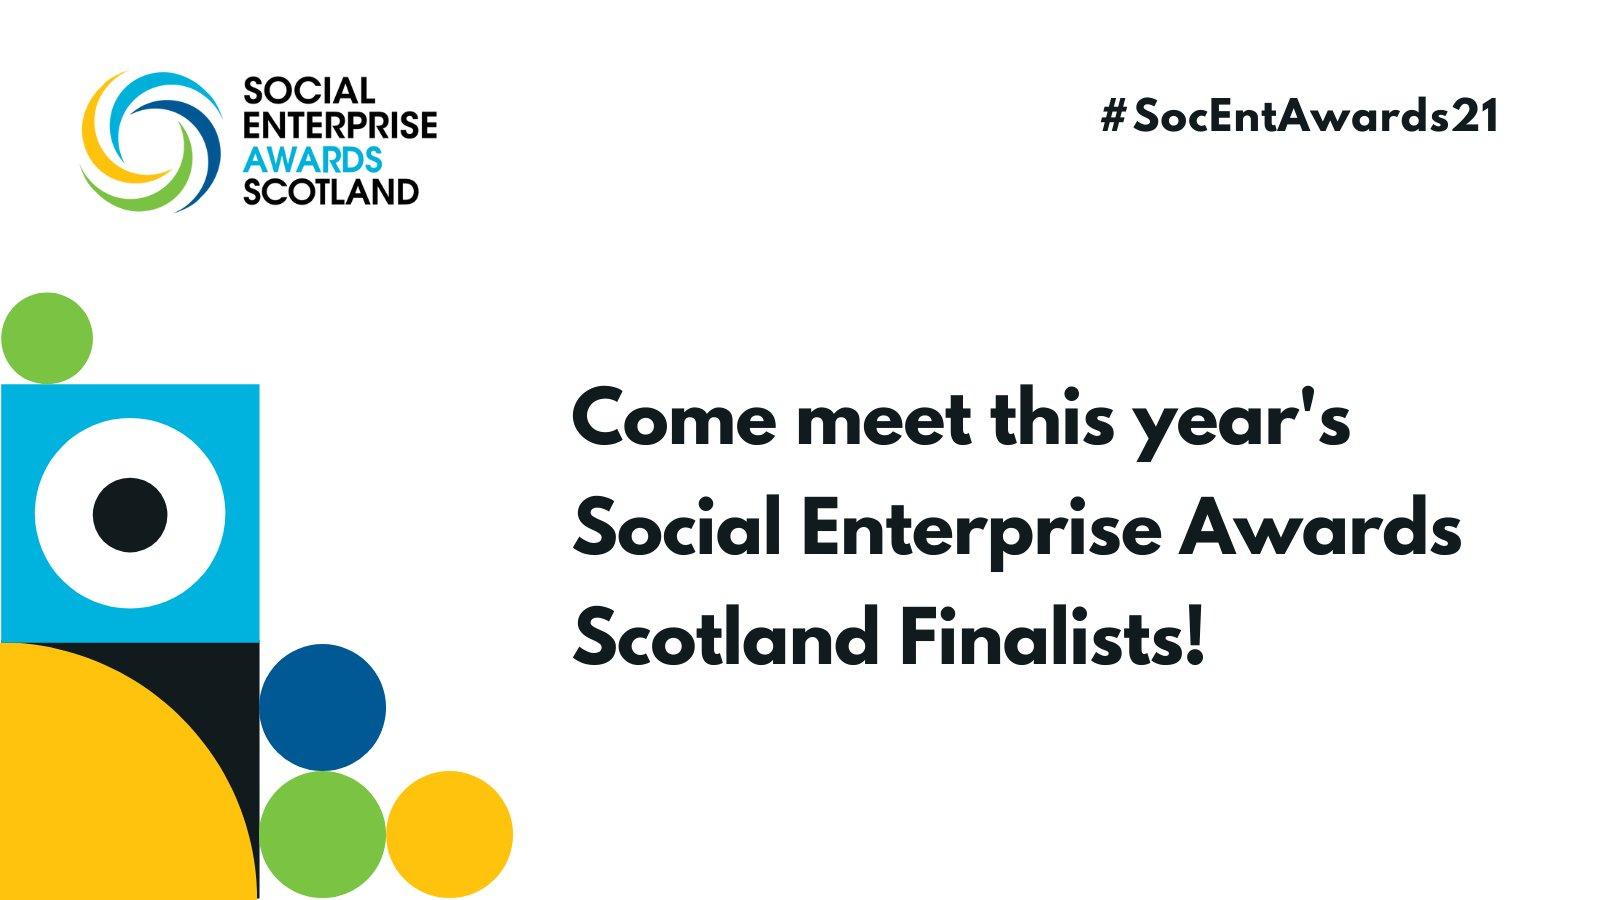 Social Enterprise Awards Scotland finalists